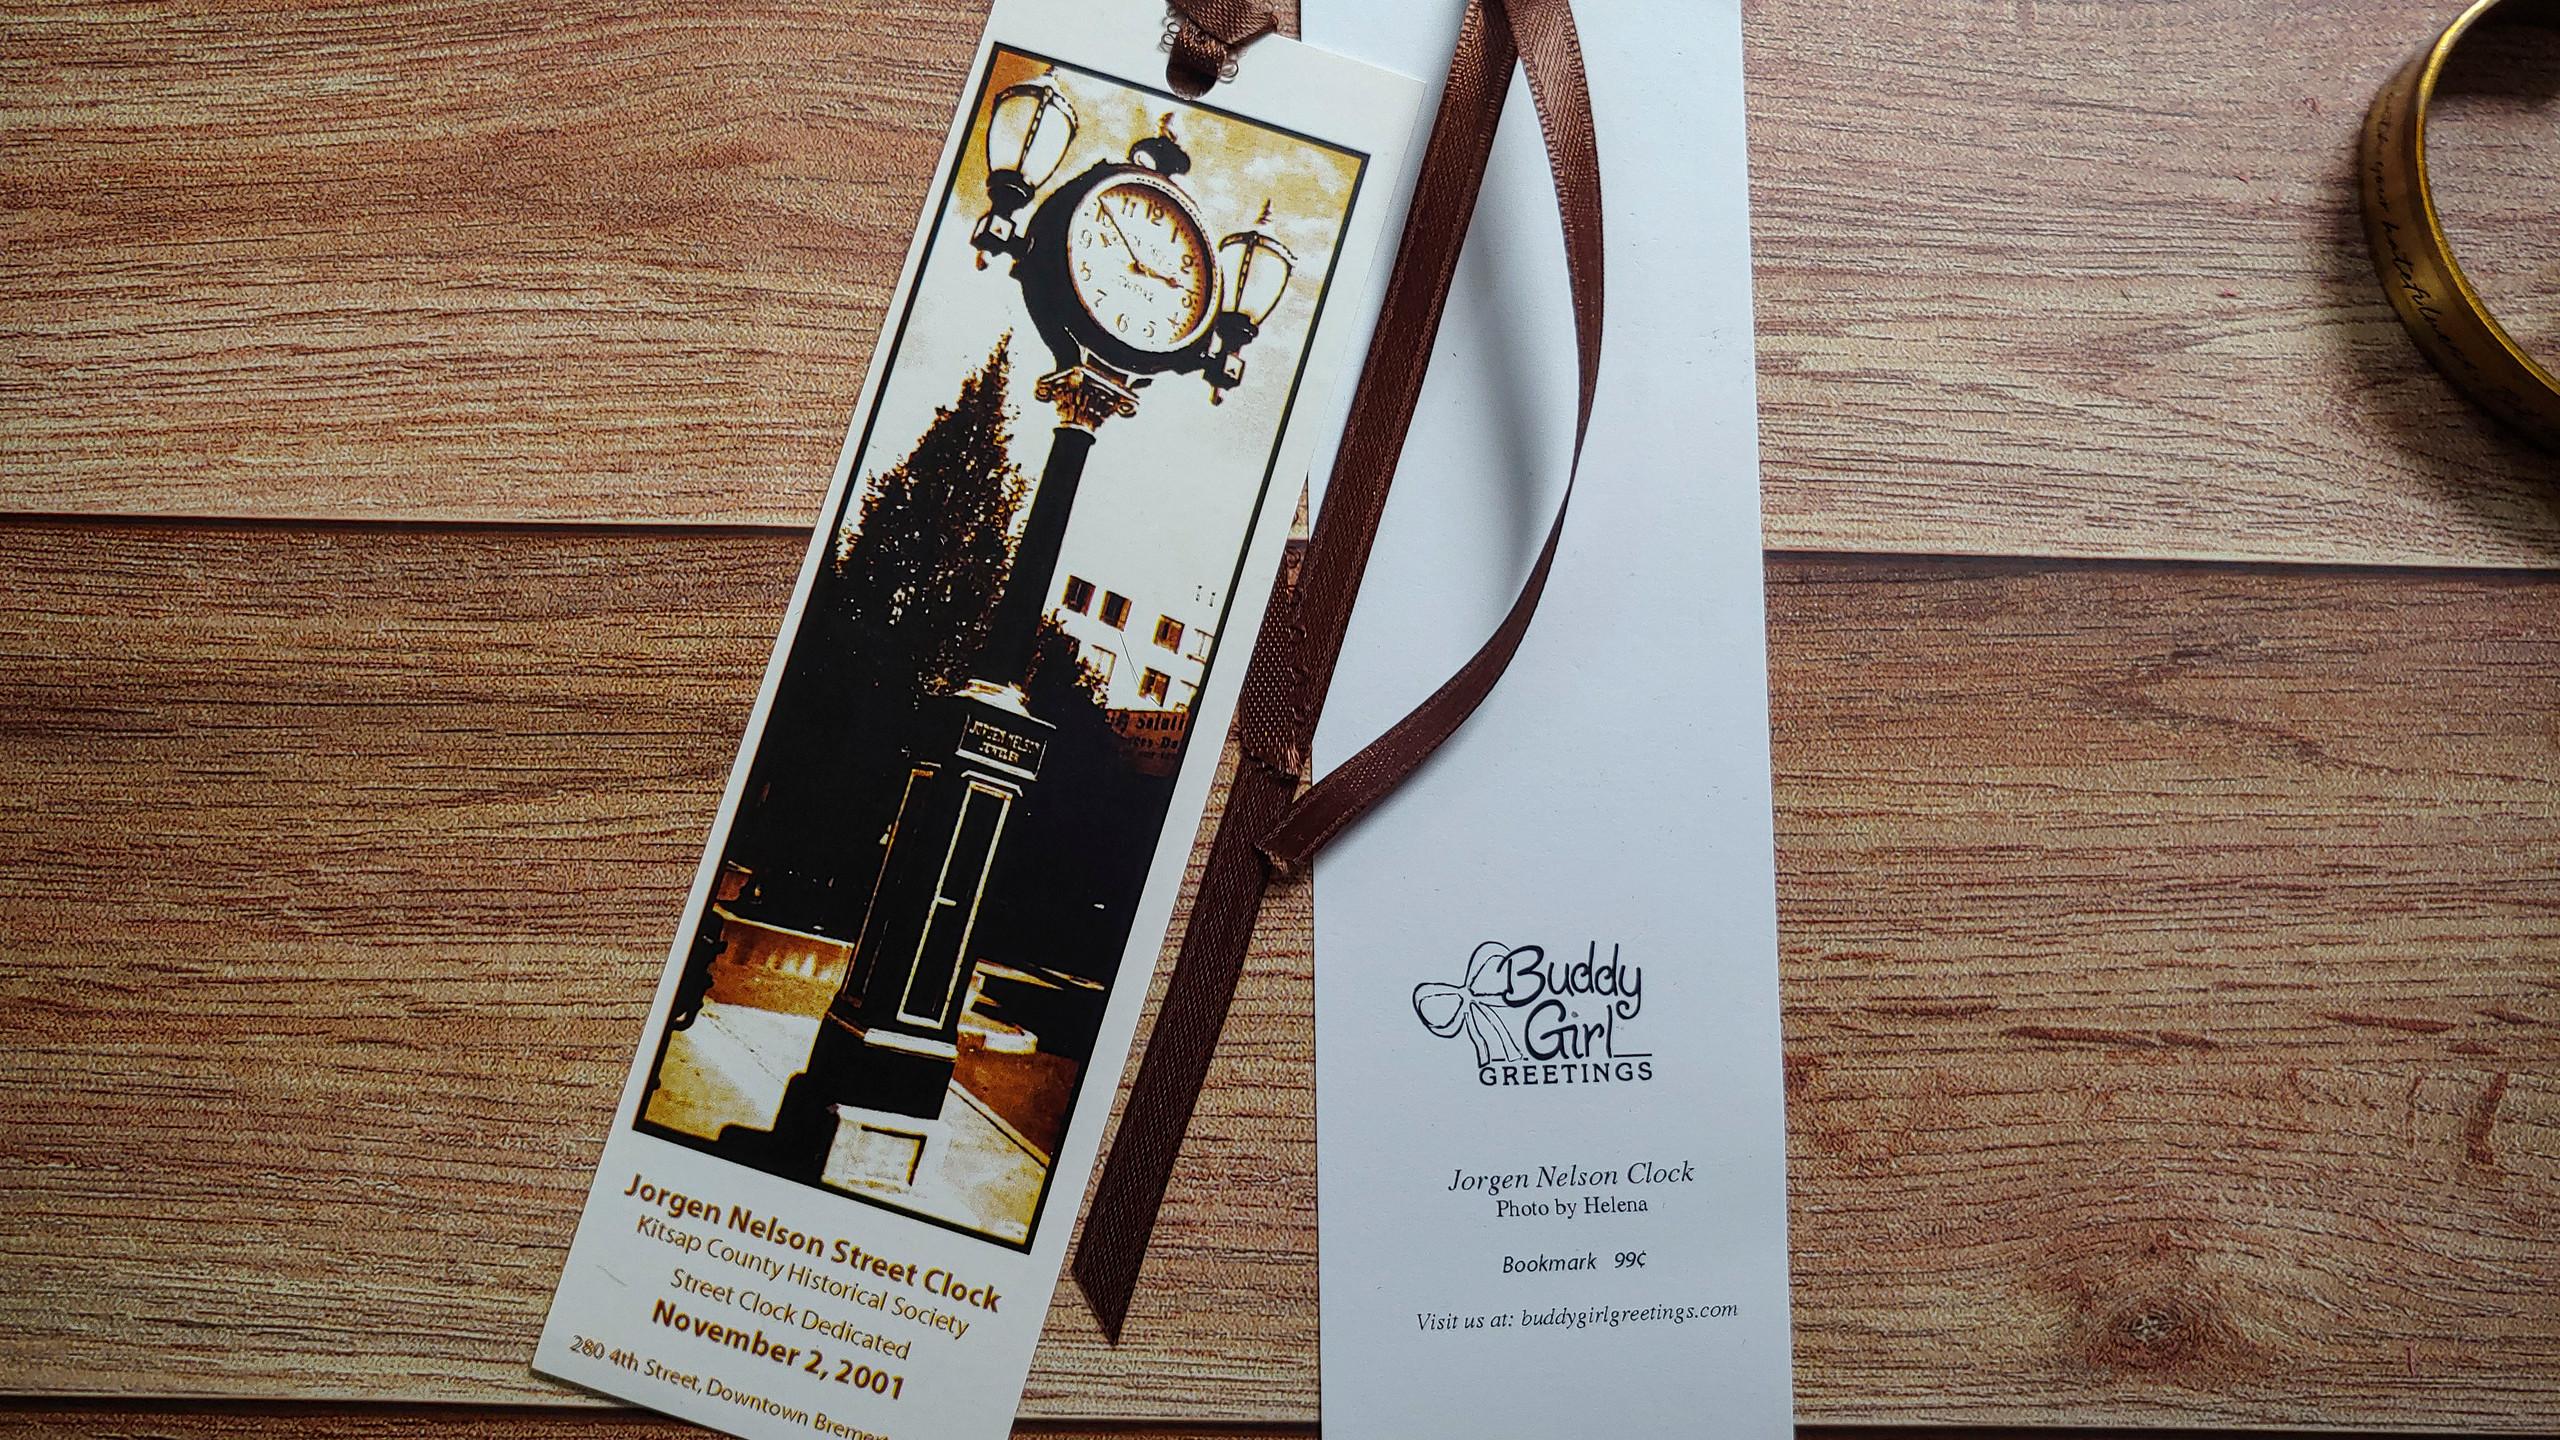 Jorgen Nelson Clock | Bookmark